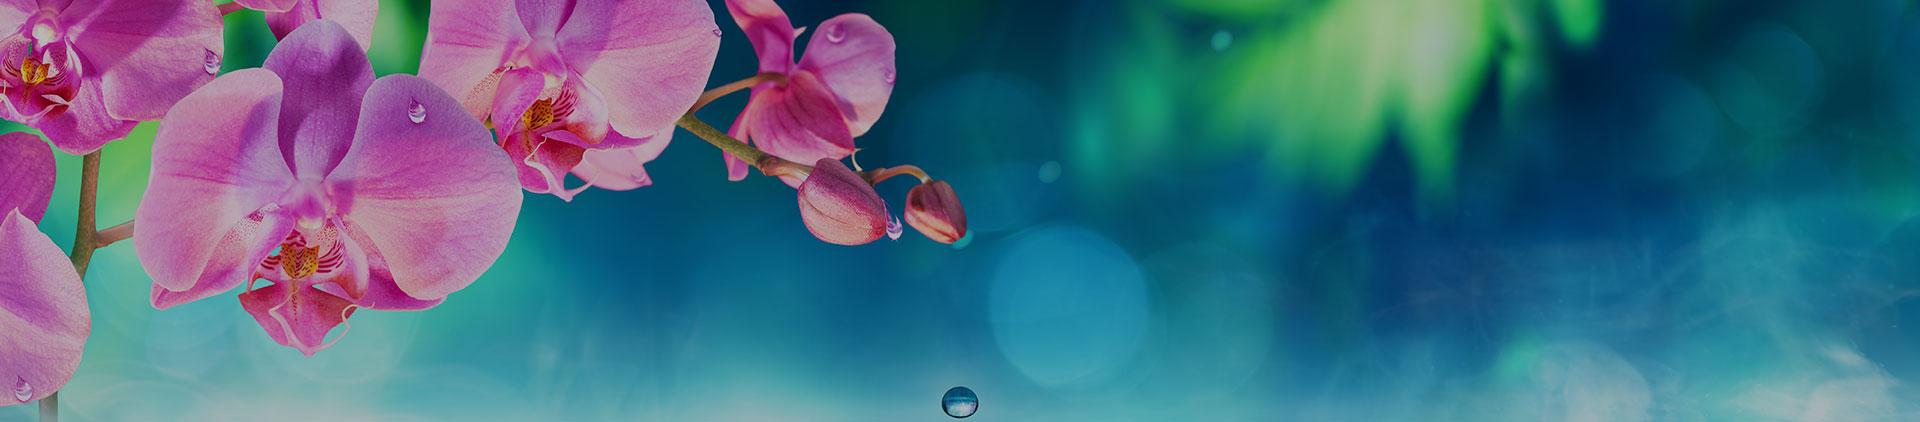 Grief & Healing | Premier Funeral Services